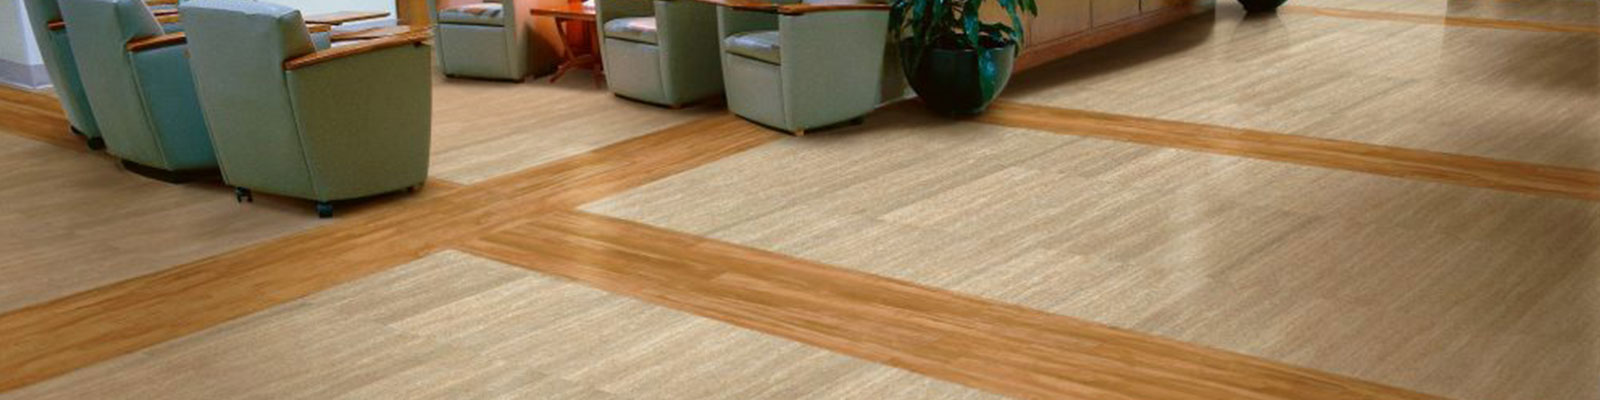 commercial luxury vinyl tile rps